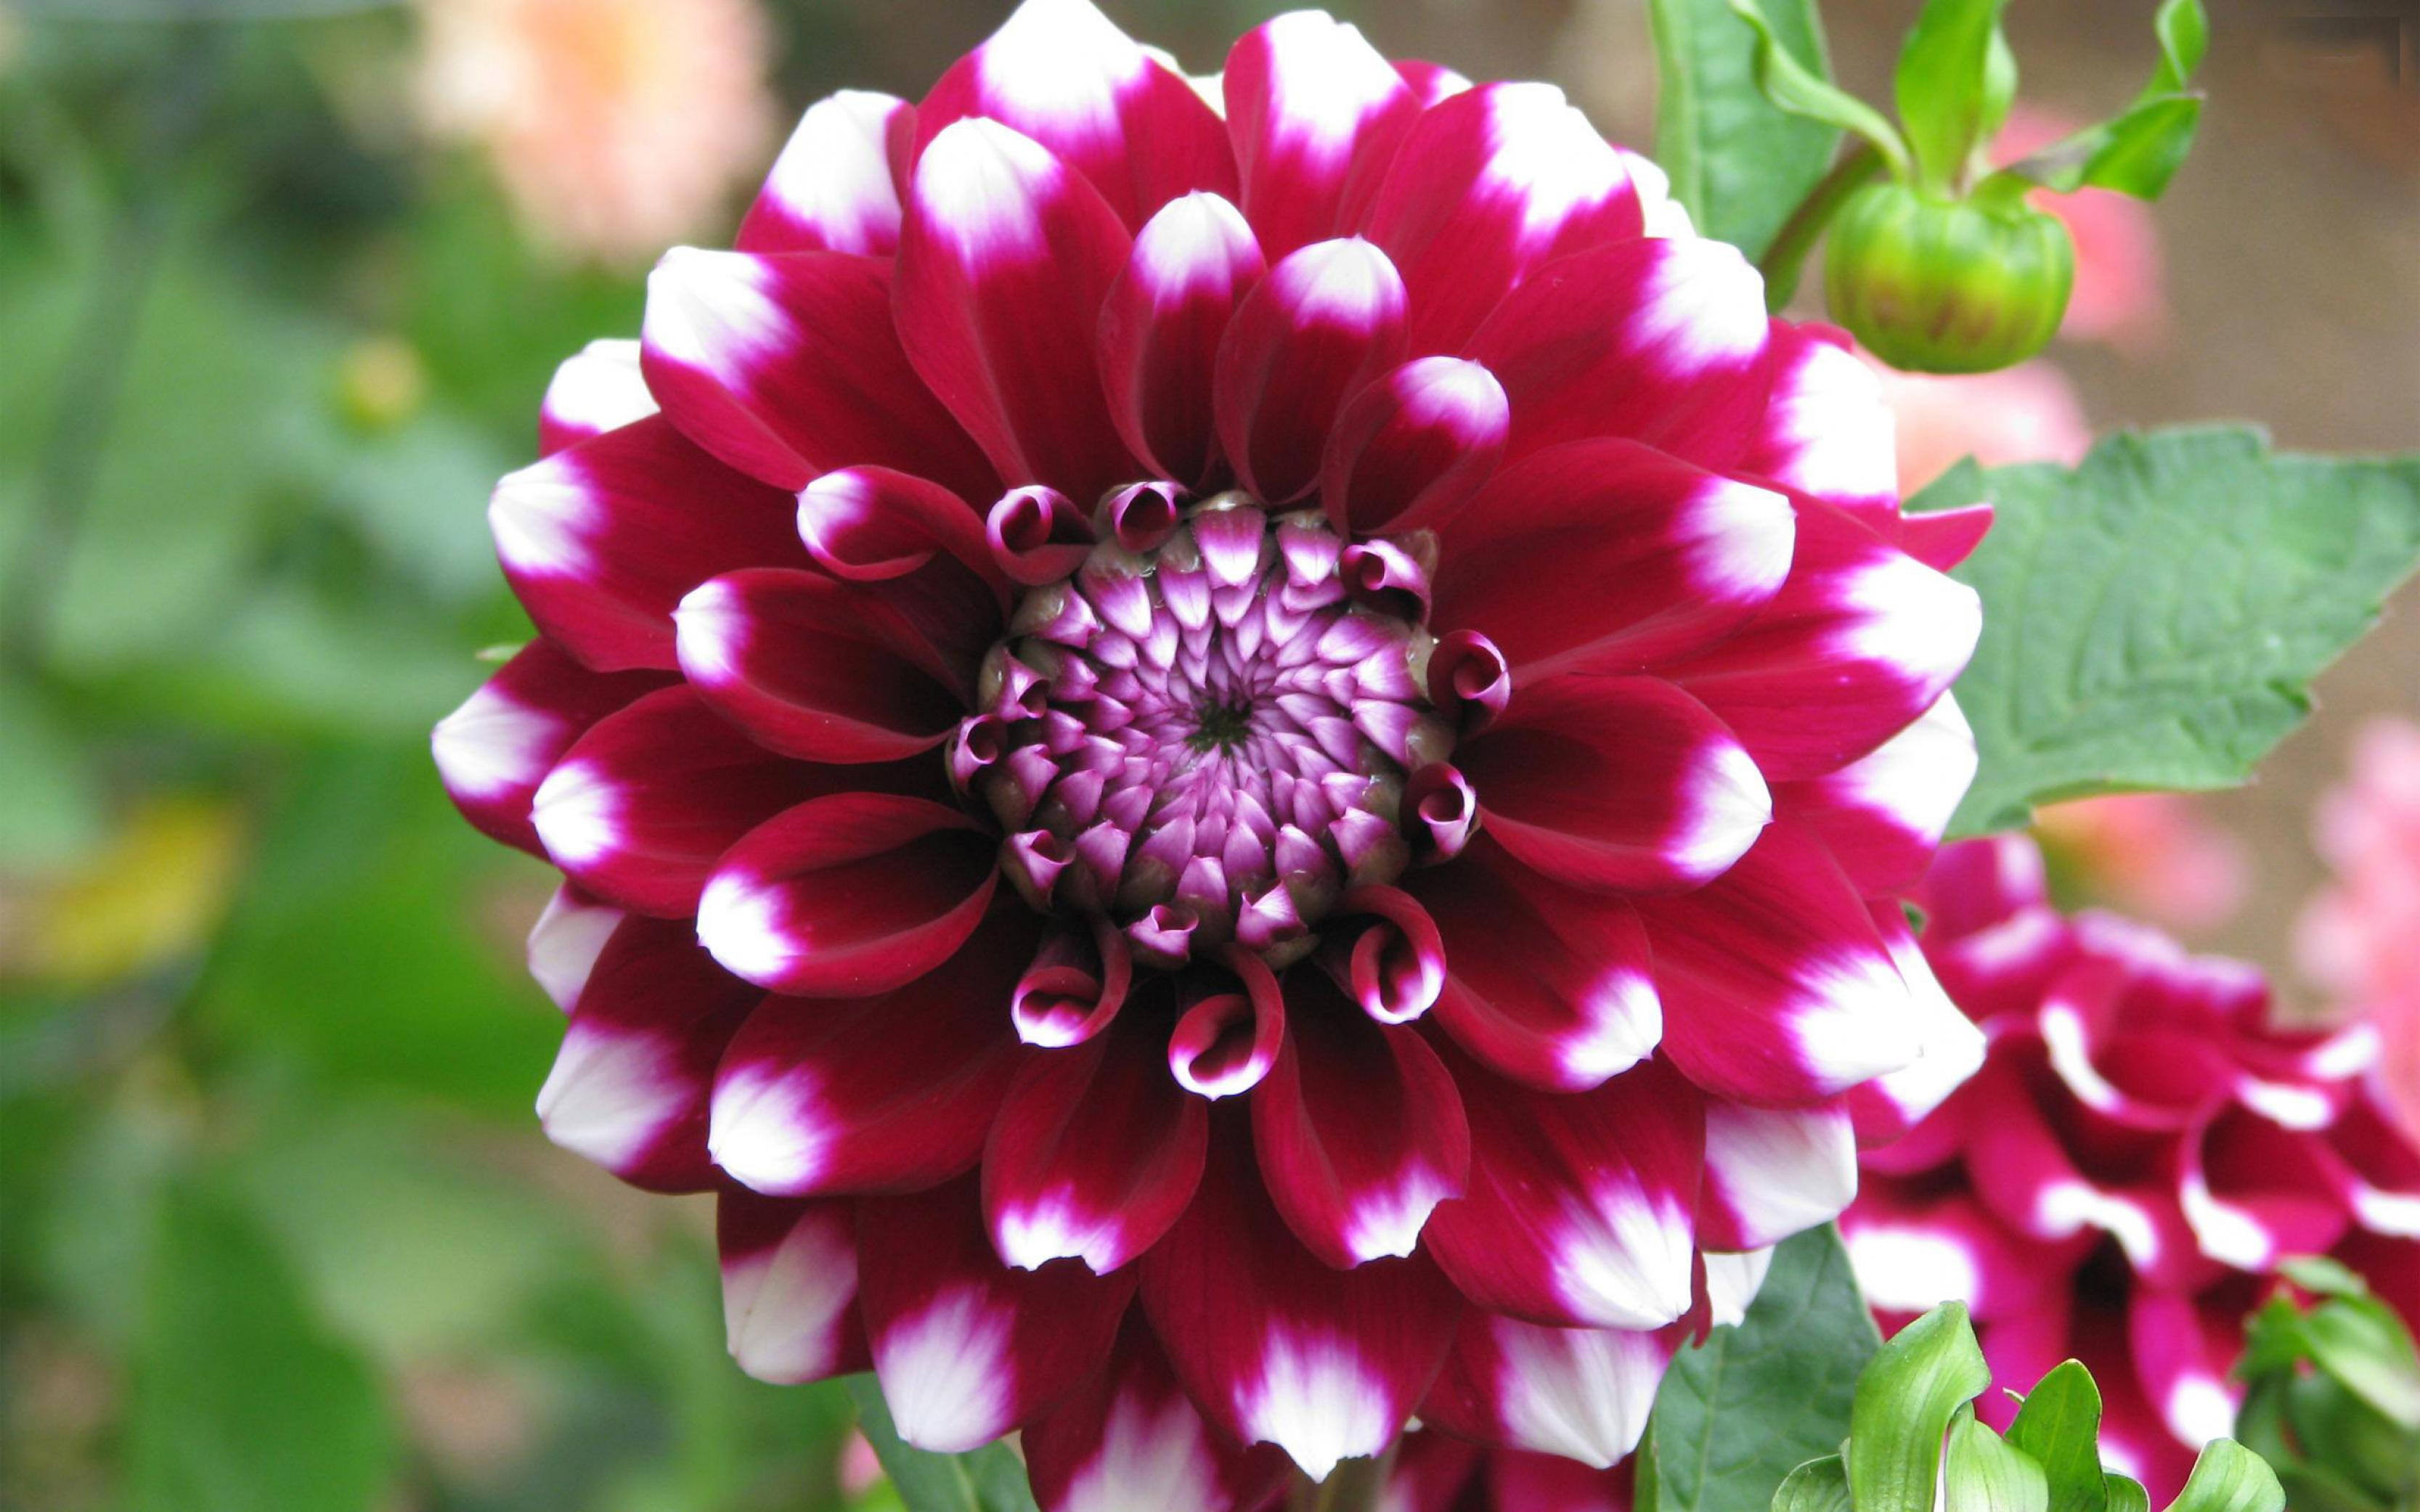 بالصور صور زهور وباقات ورد جميلة 20160724 688